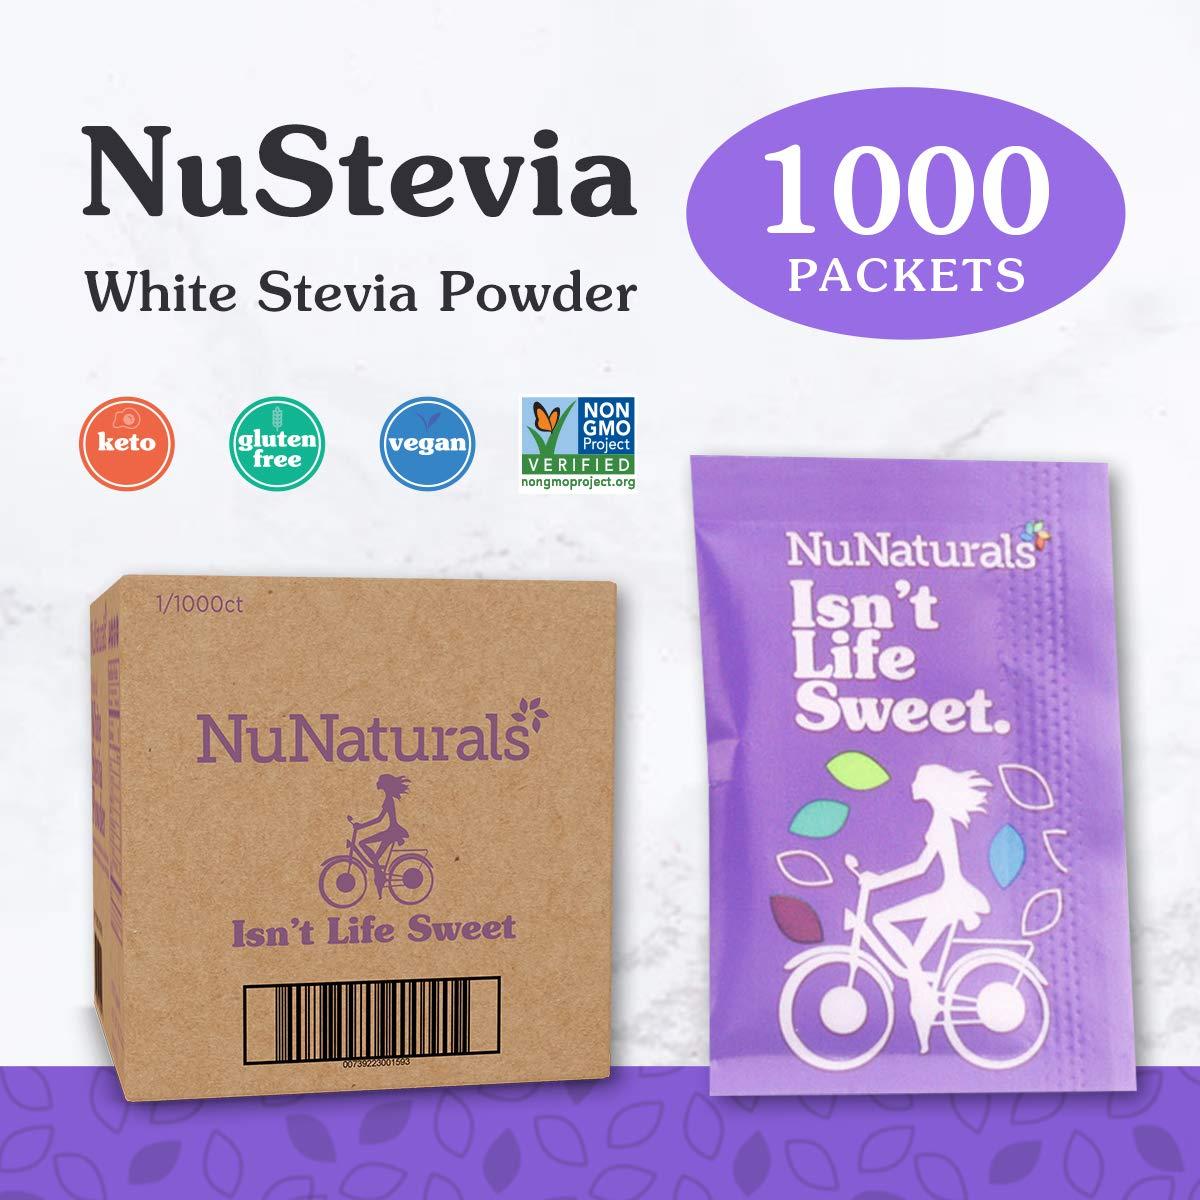 NuNaturals White Stevia Powder All Purpose Natural Sweetener, Sugar-Free 1,000 Packets